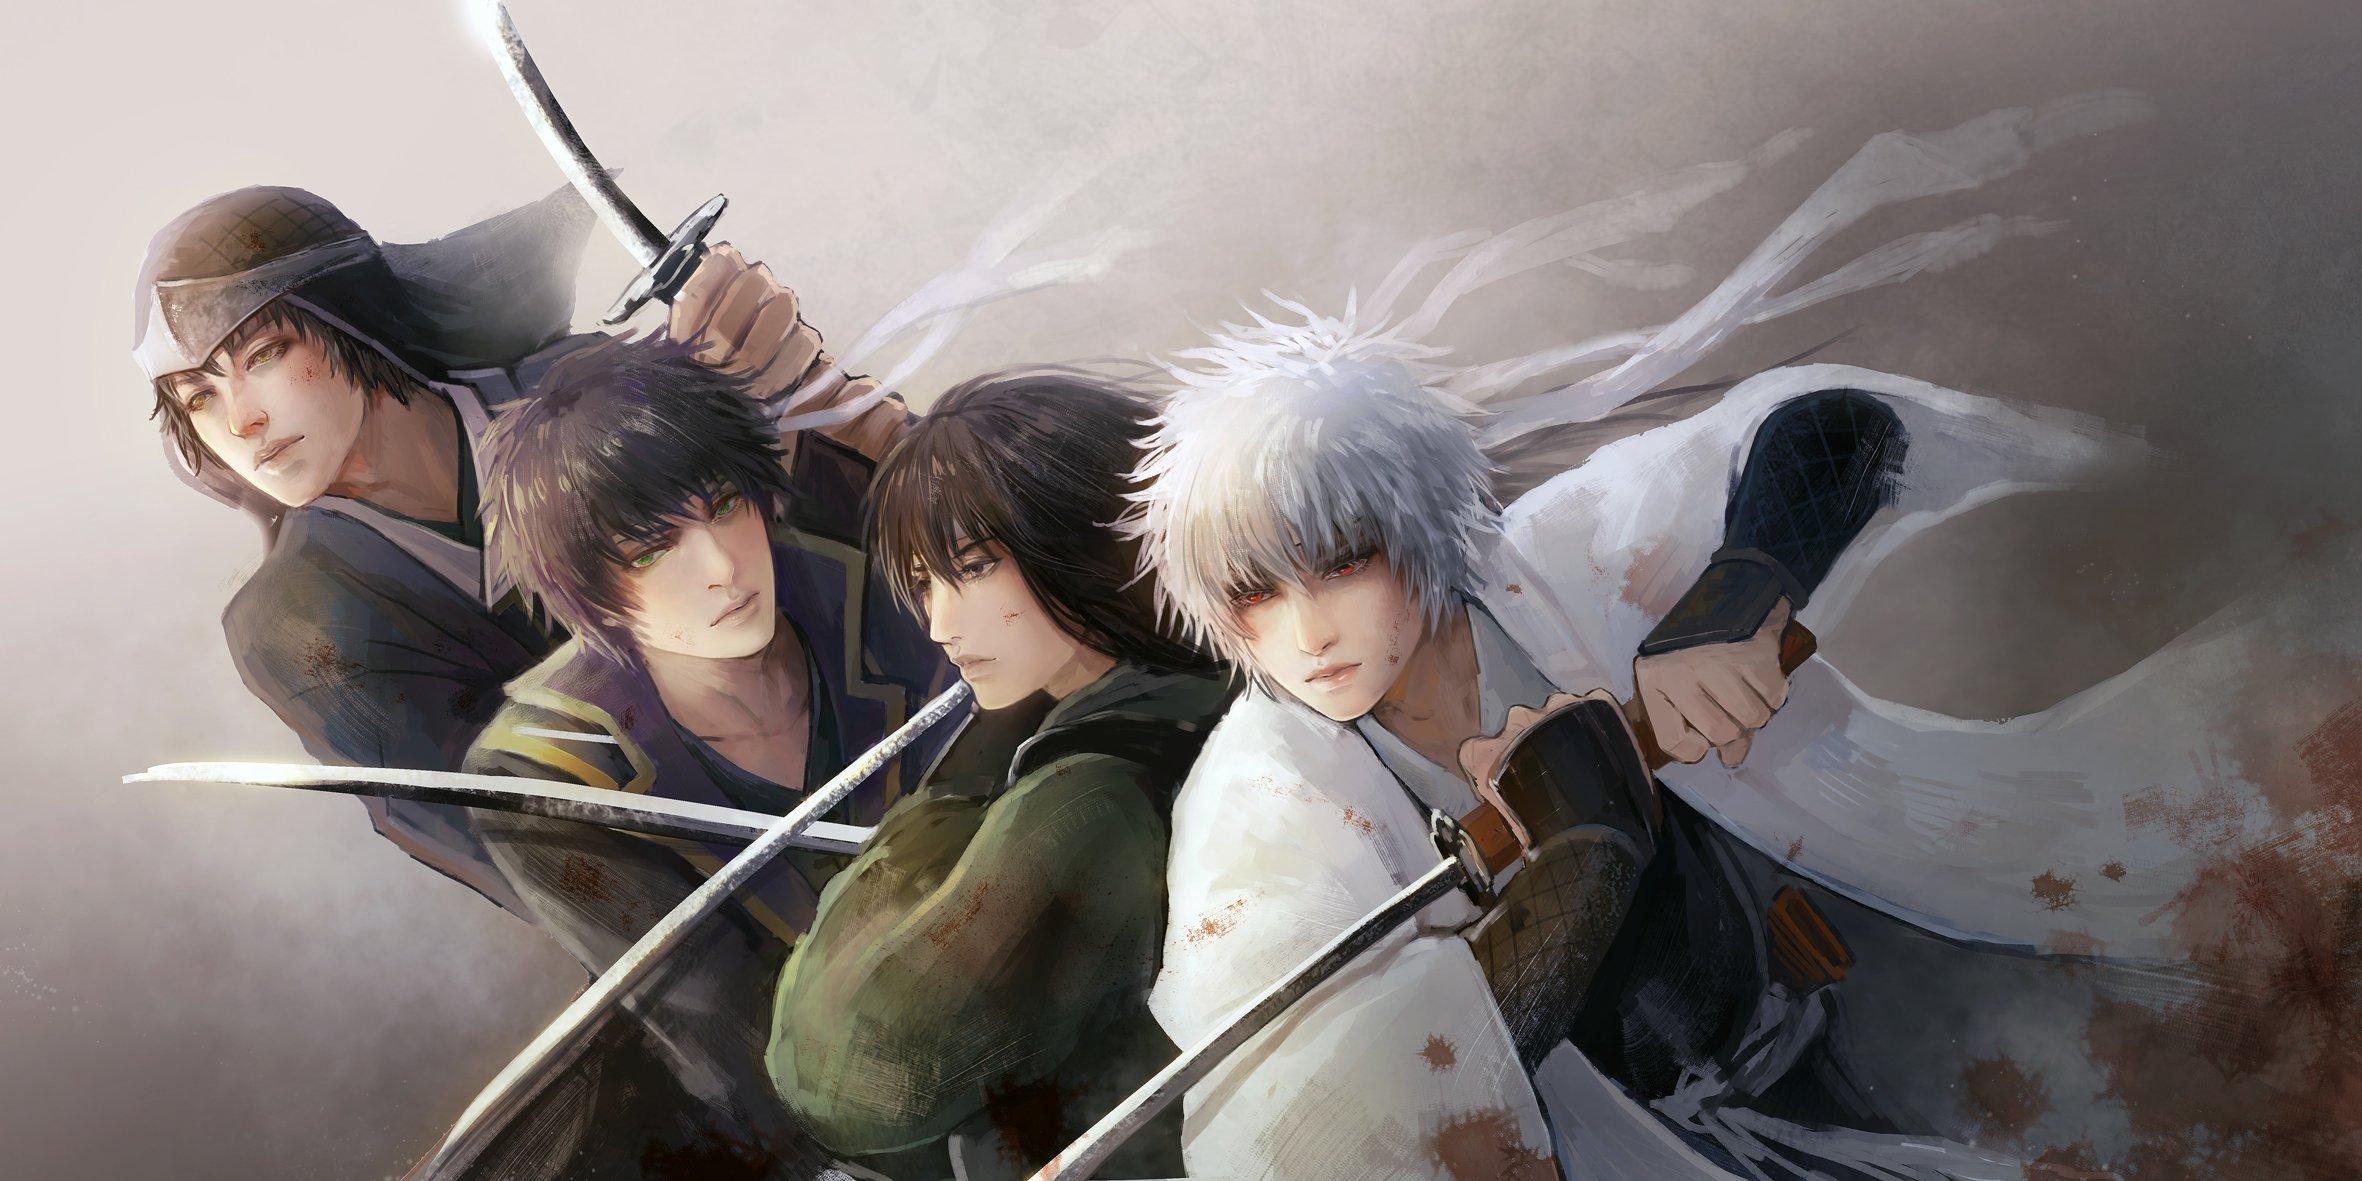 Hd wallpaper anime couple - Anime Series Gintama Sword Samurai Warrior Guys Character